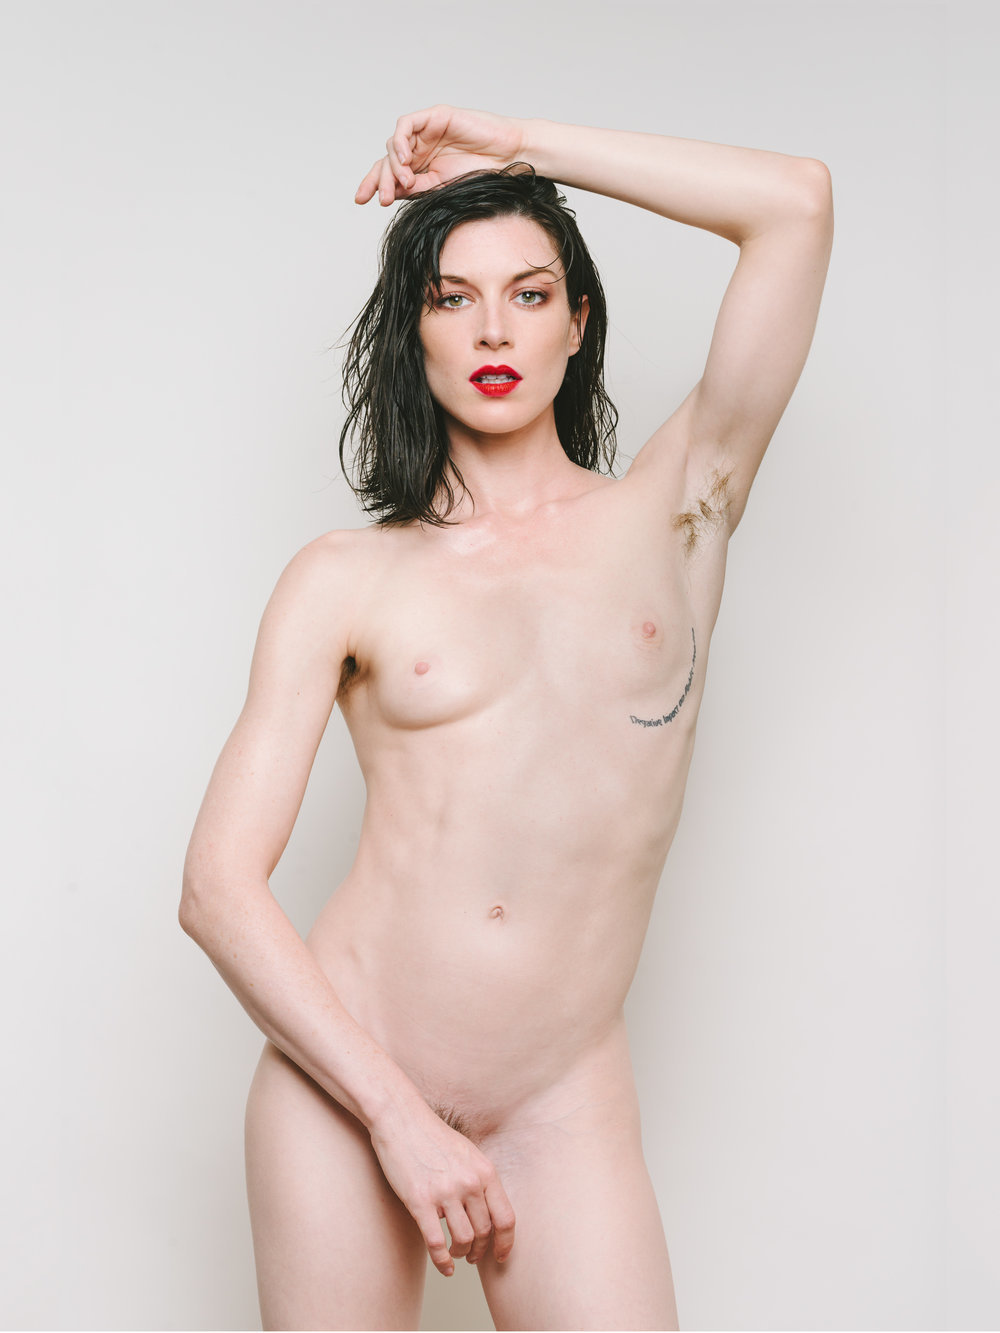 Порно актриса долл